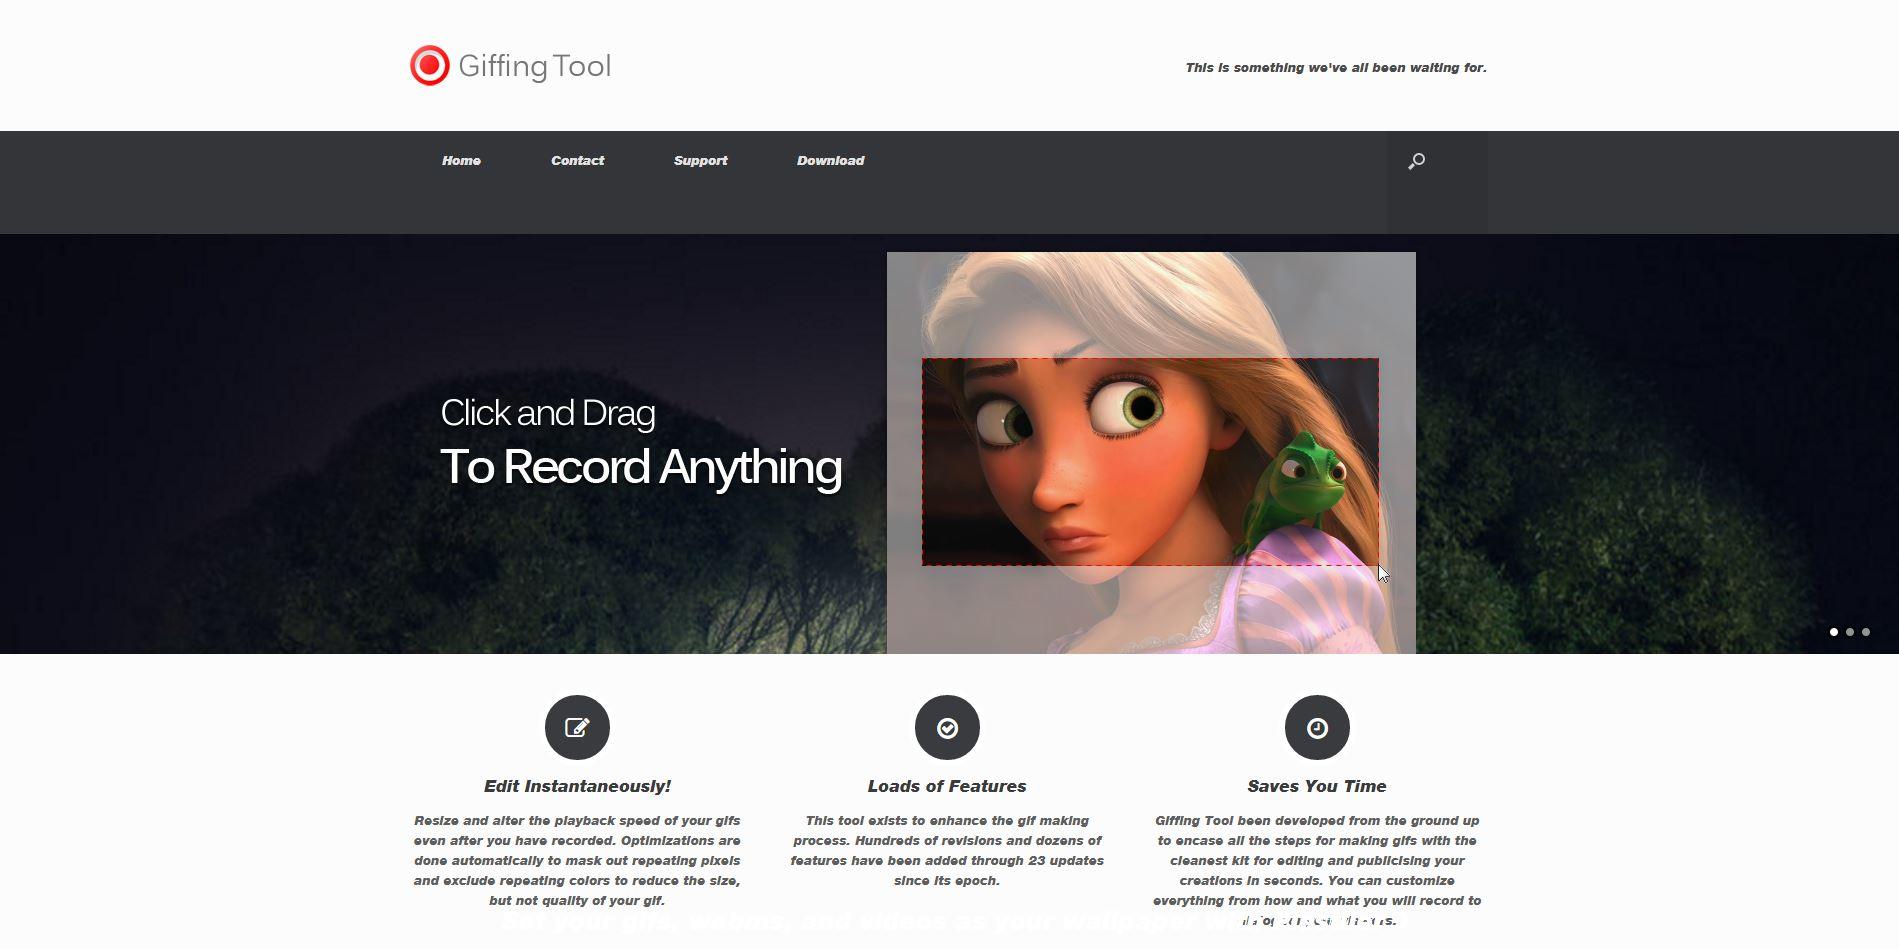 giffingtool-crear imagenes online